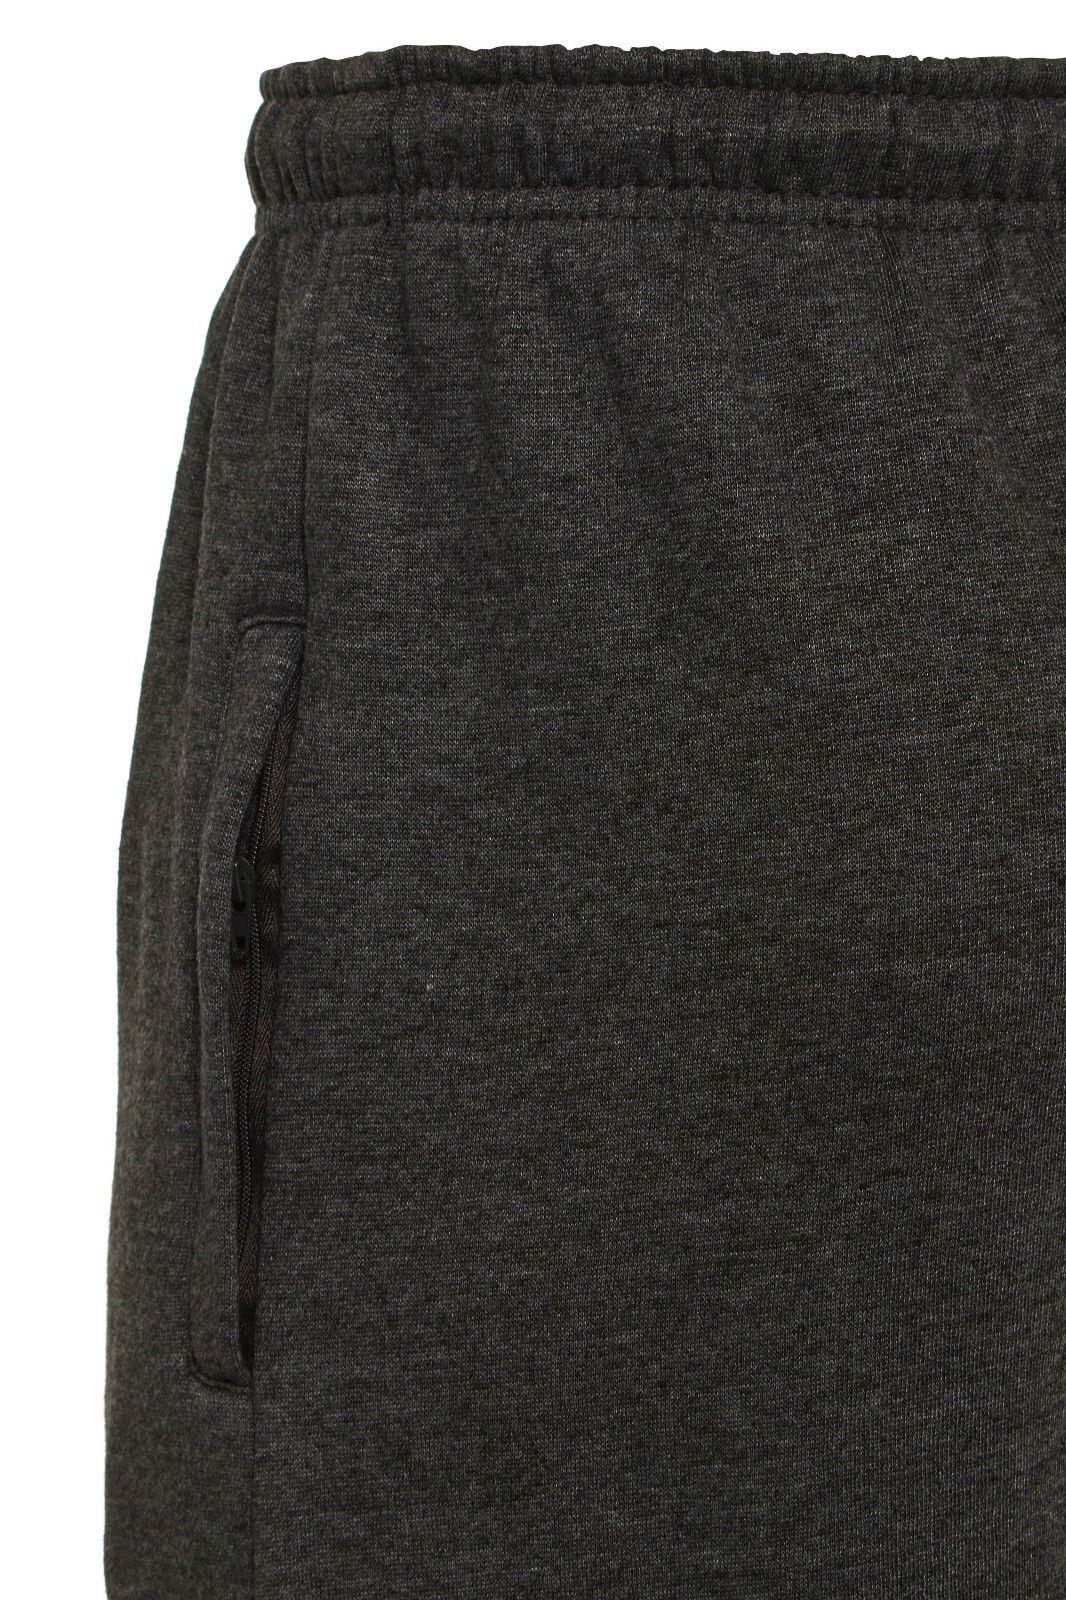 Uomo-Casual-Tinta-Unita-Pantaloni-sportivi-Bottoms-Apri-Hem-Sudore-Pantaloni-Tasche-Con-Zip miniatura 7